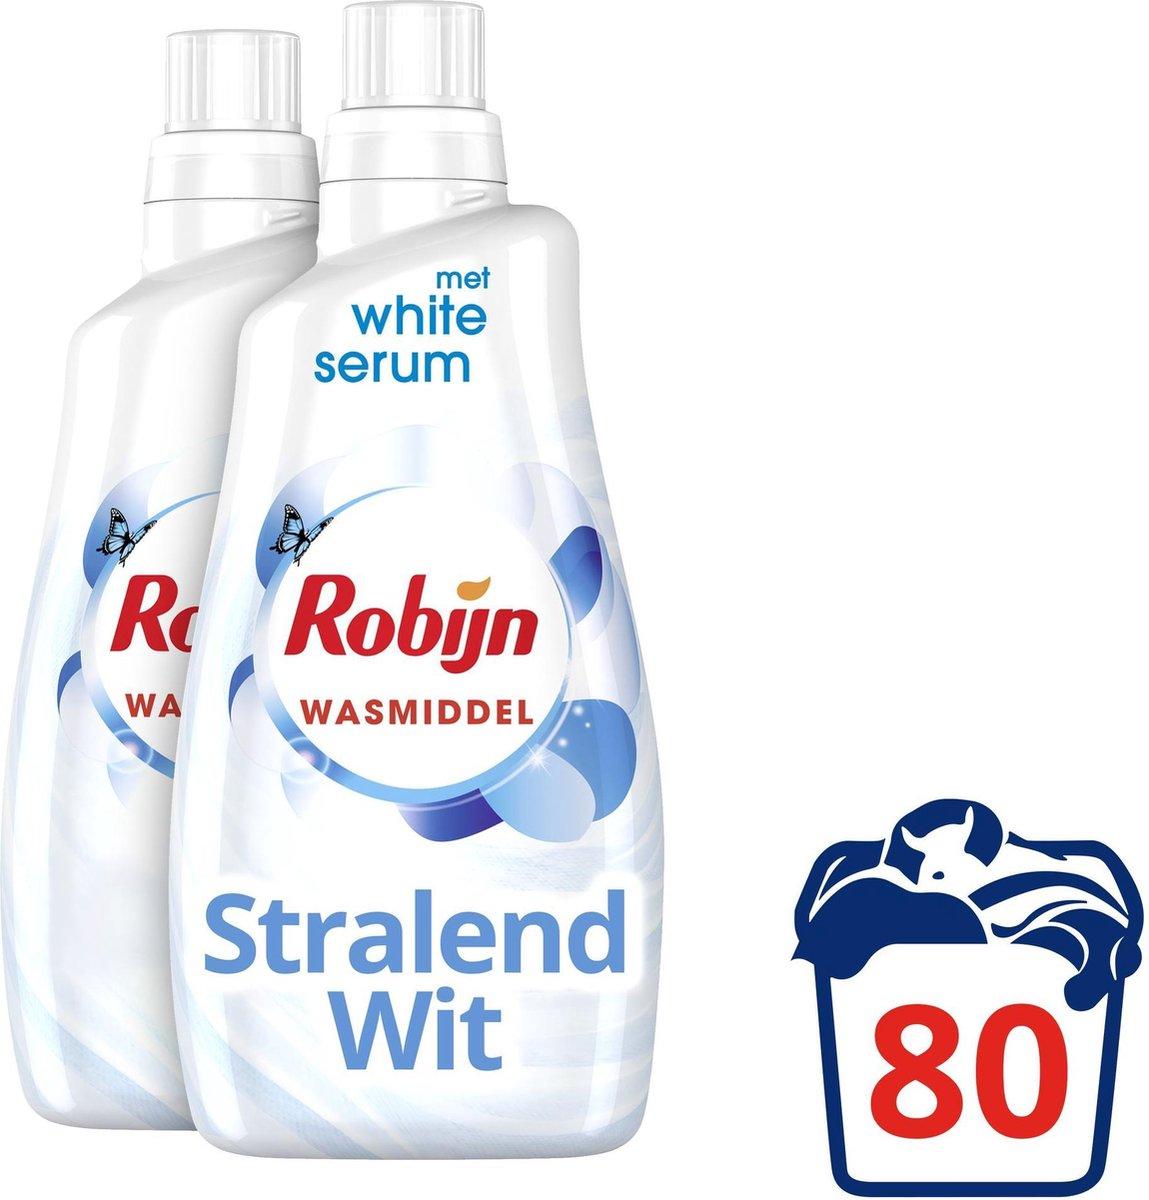 Robijn Stralend Wit Wasmiddel - 2 x 40 wasbeurten